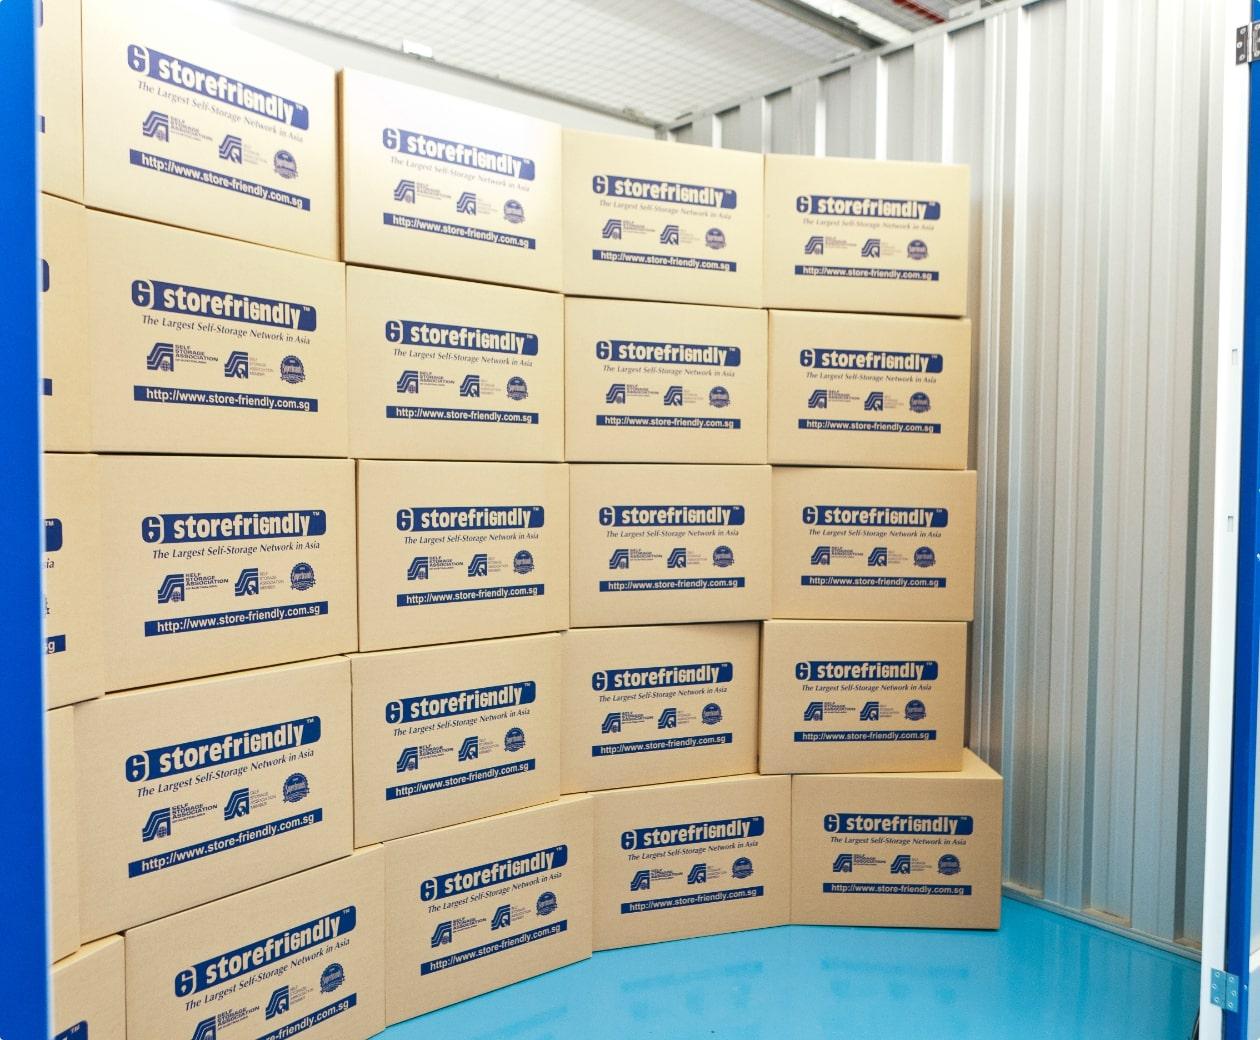 Storefriendly cardboard boxes inside a storage unit